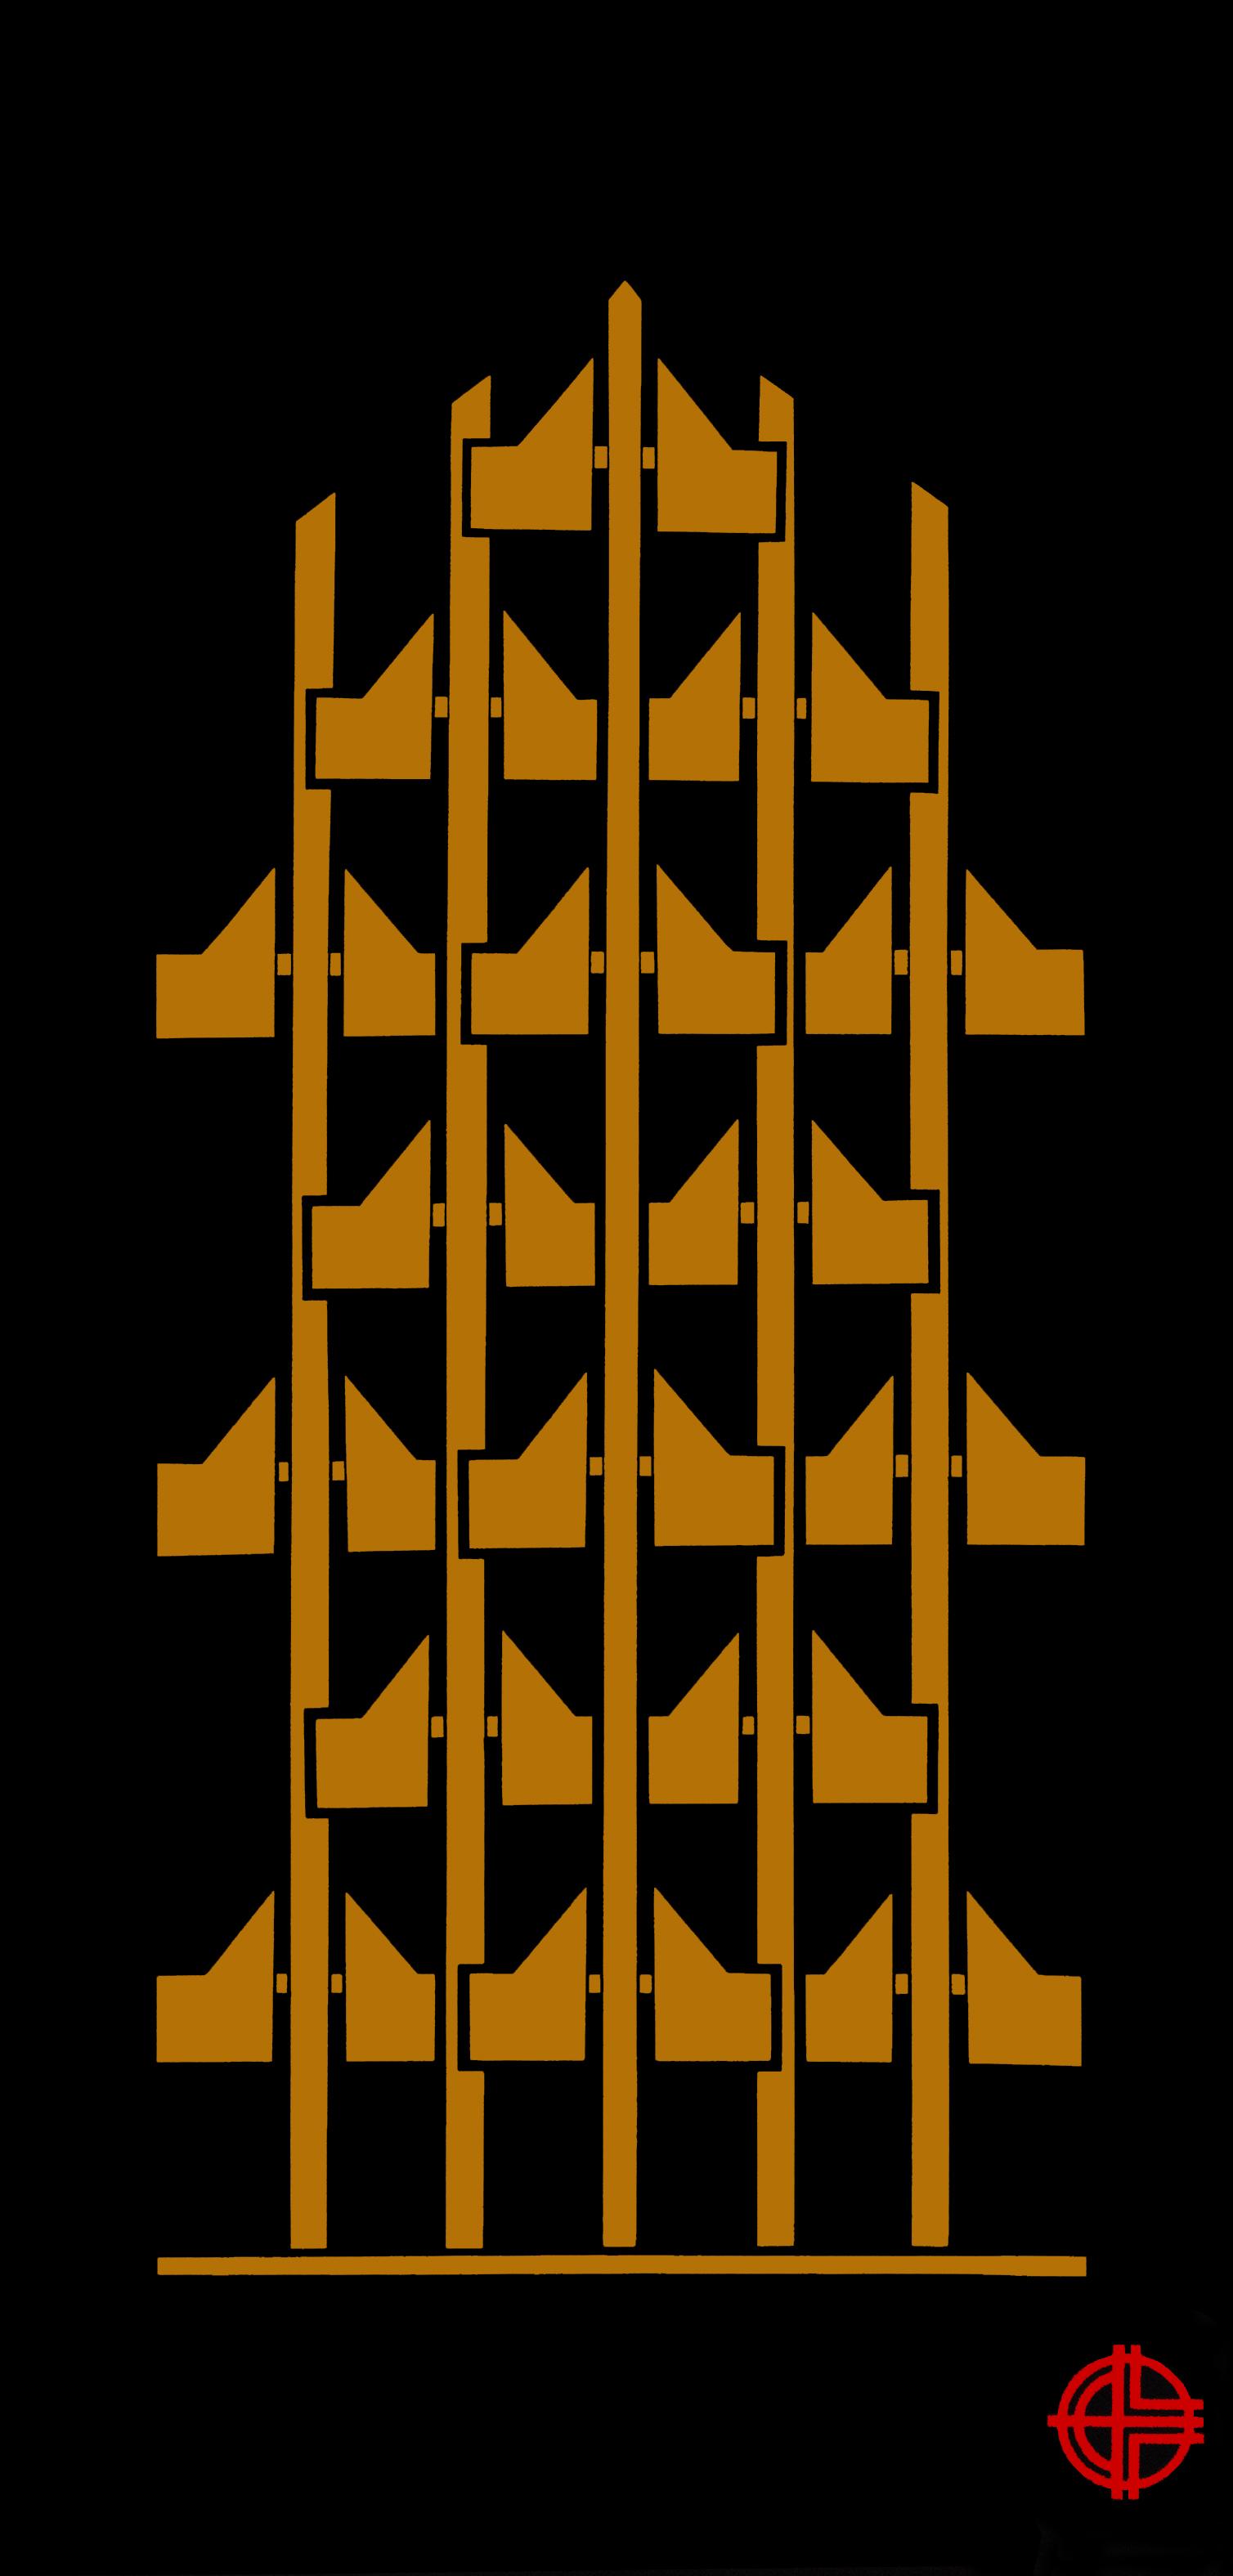 Formación en abertura III / Opening formation III.